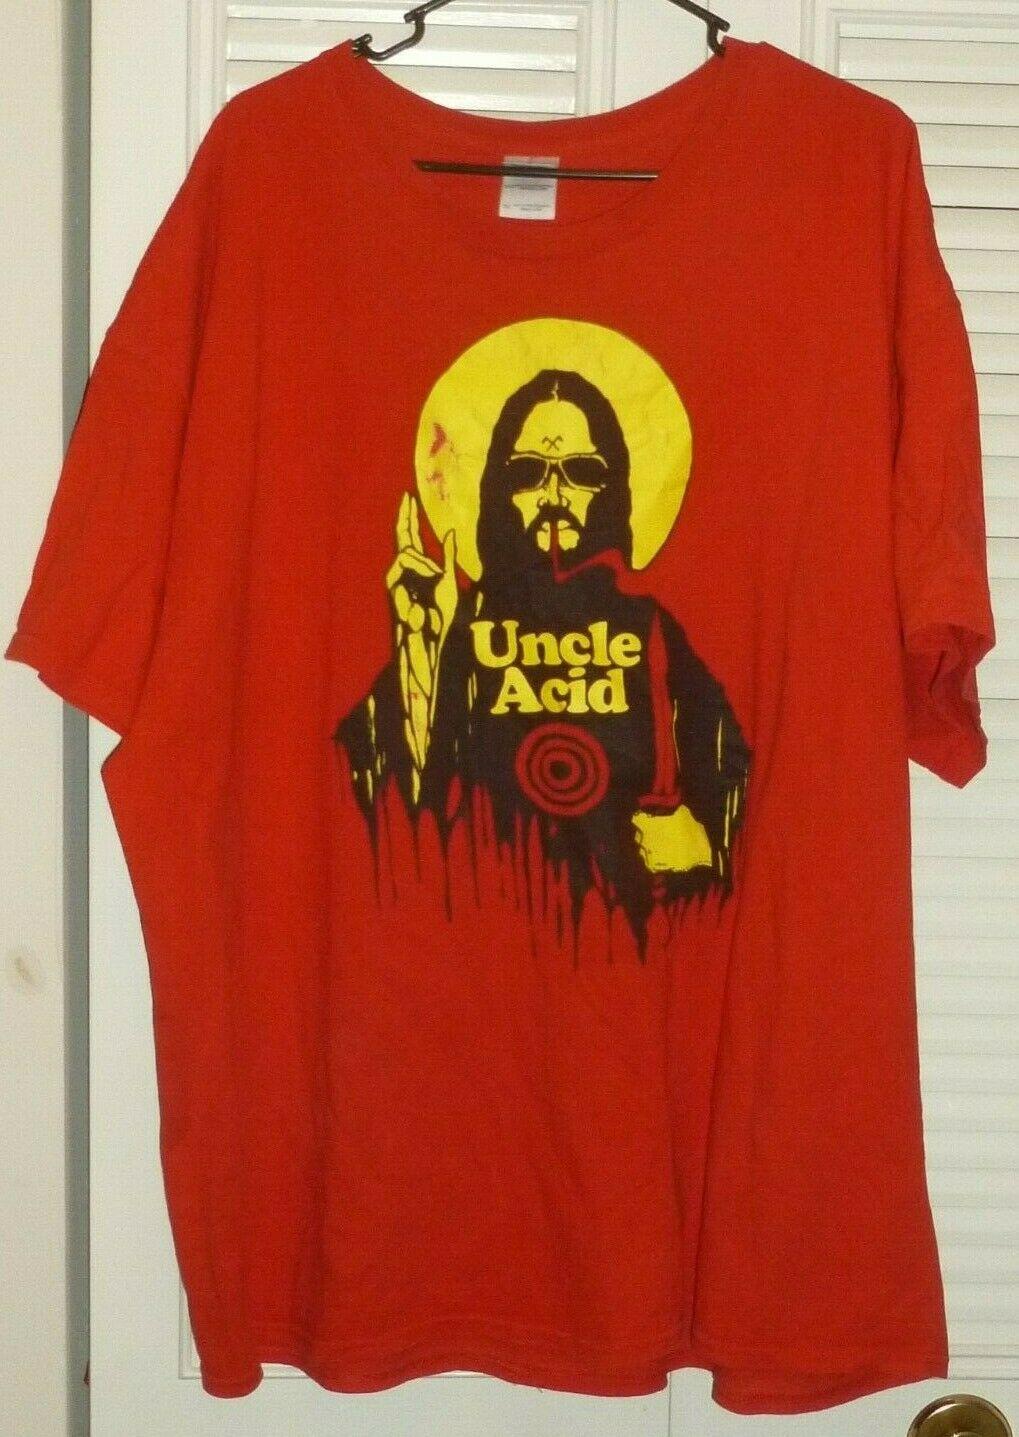 Uncle Acid Shirt Rock Metal Doom 3Xlarge 100% Cotton T-Shirt And The Deadbeats